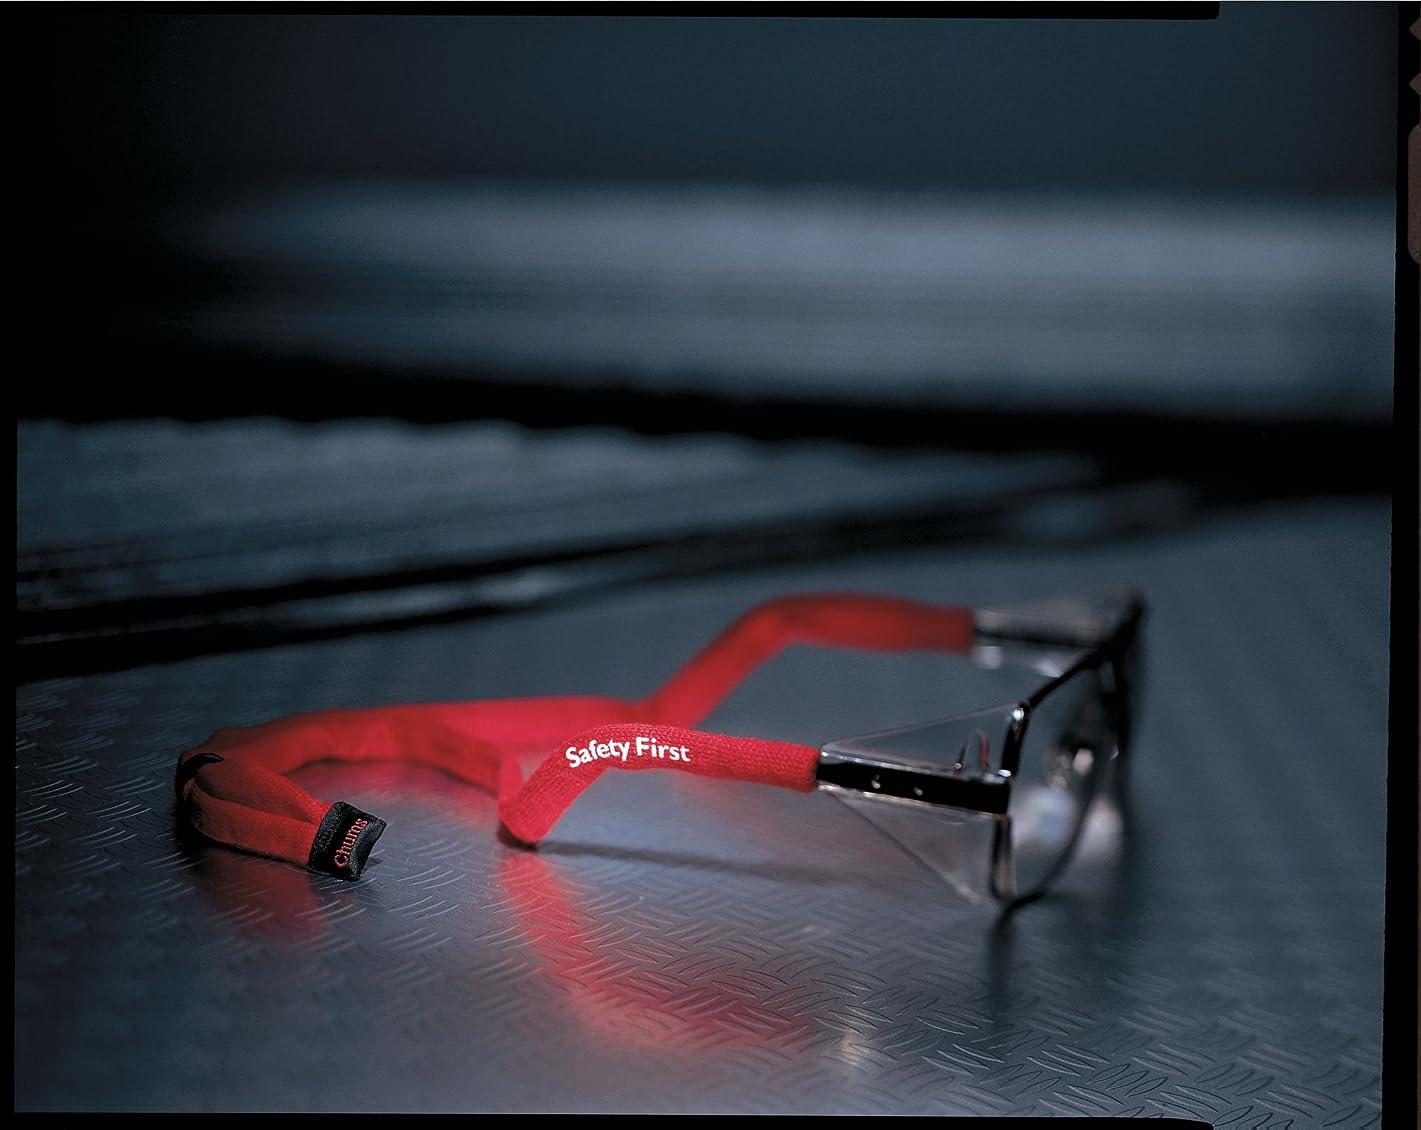 Eyewear Rtnr, Sol, 27 in, Cotton, PK25